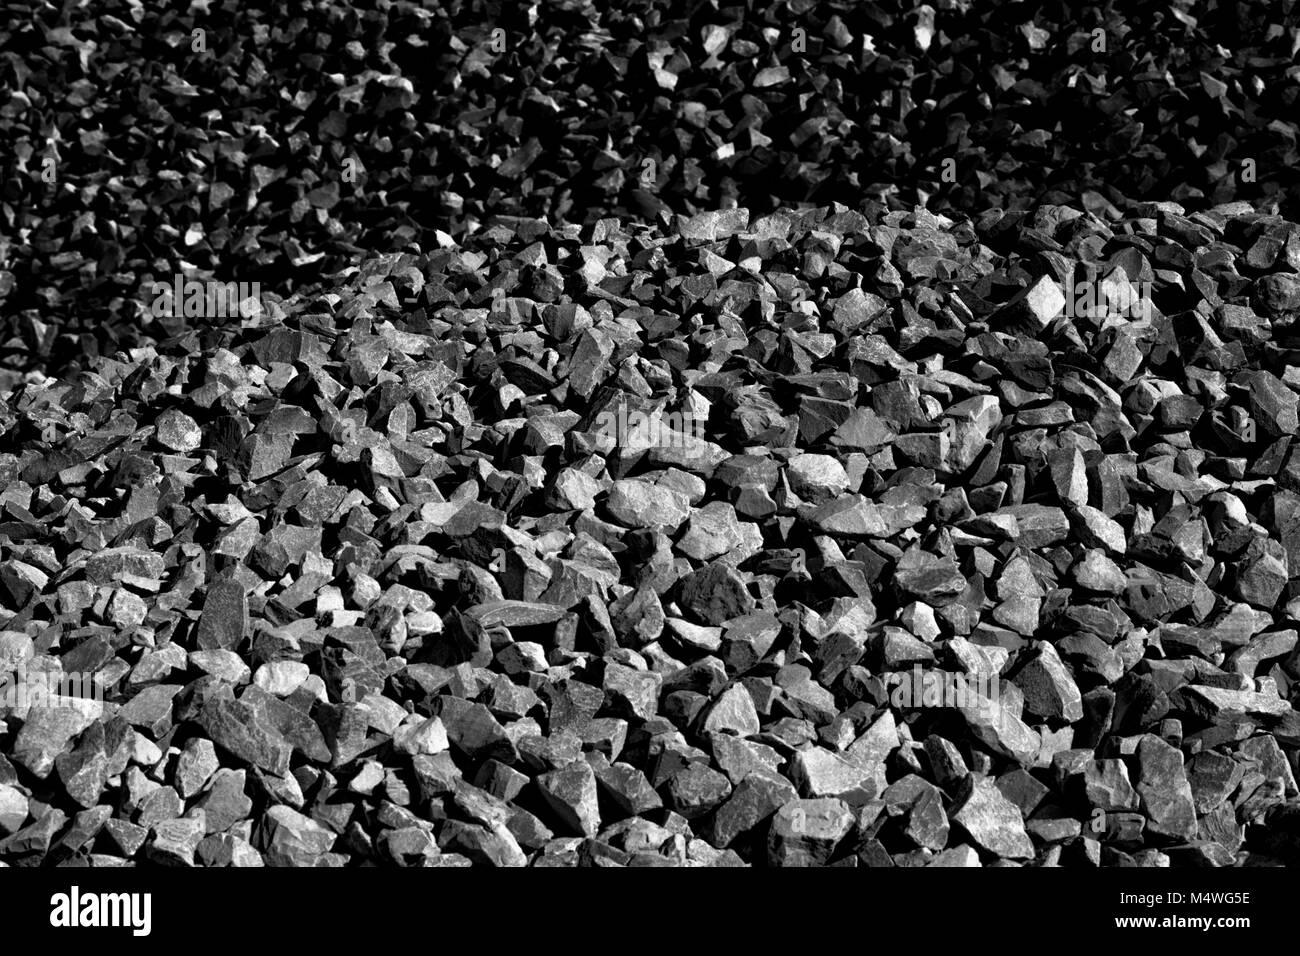 Crushed stone, open cast mining - Stock Image